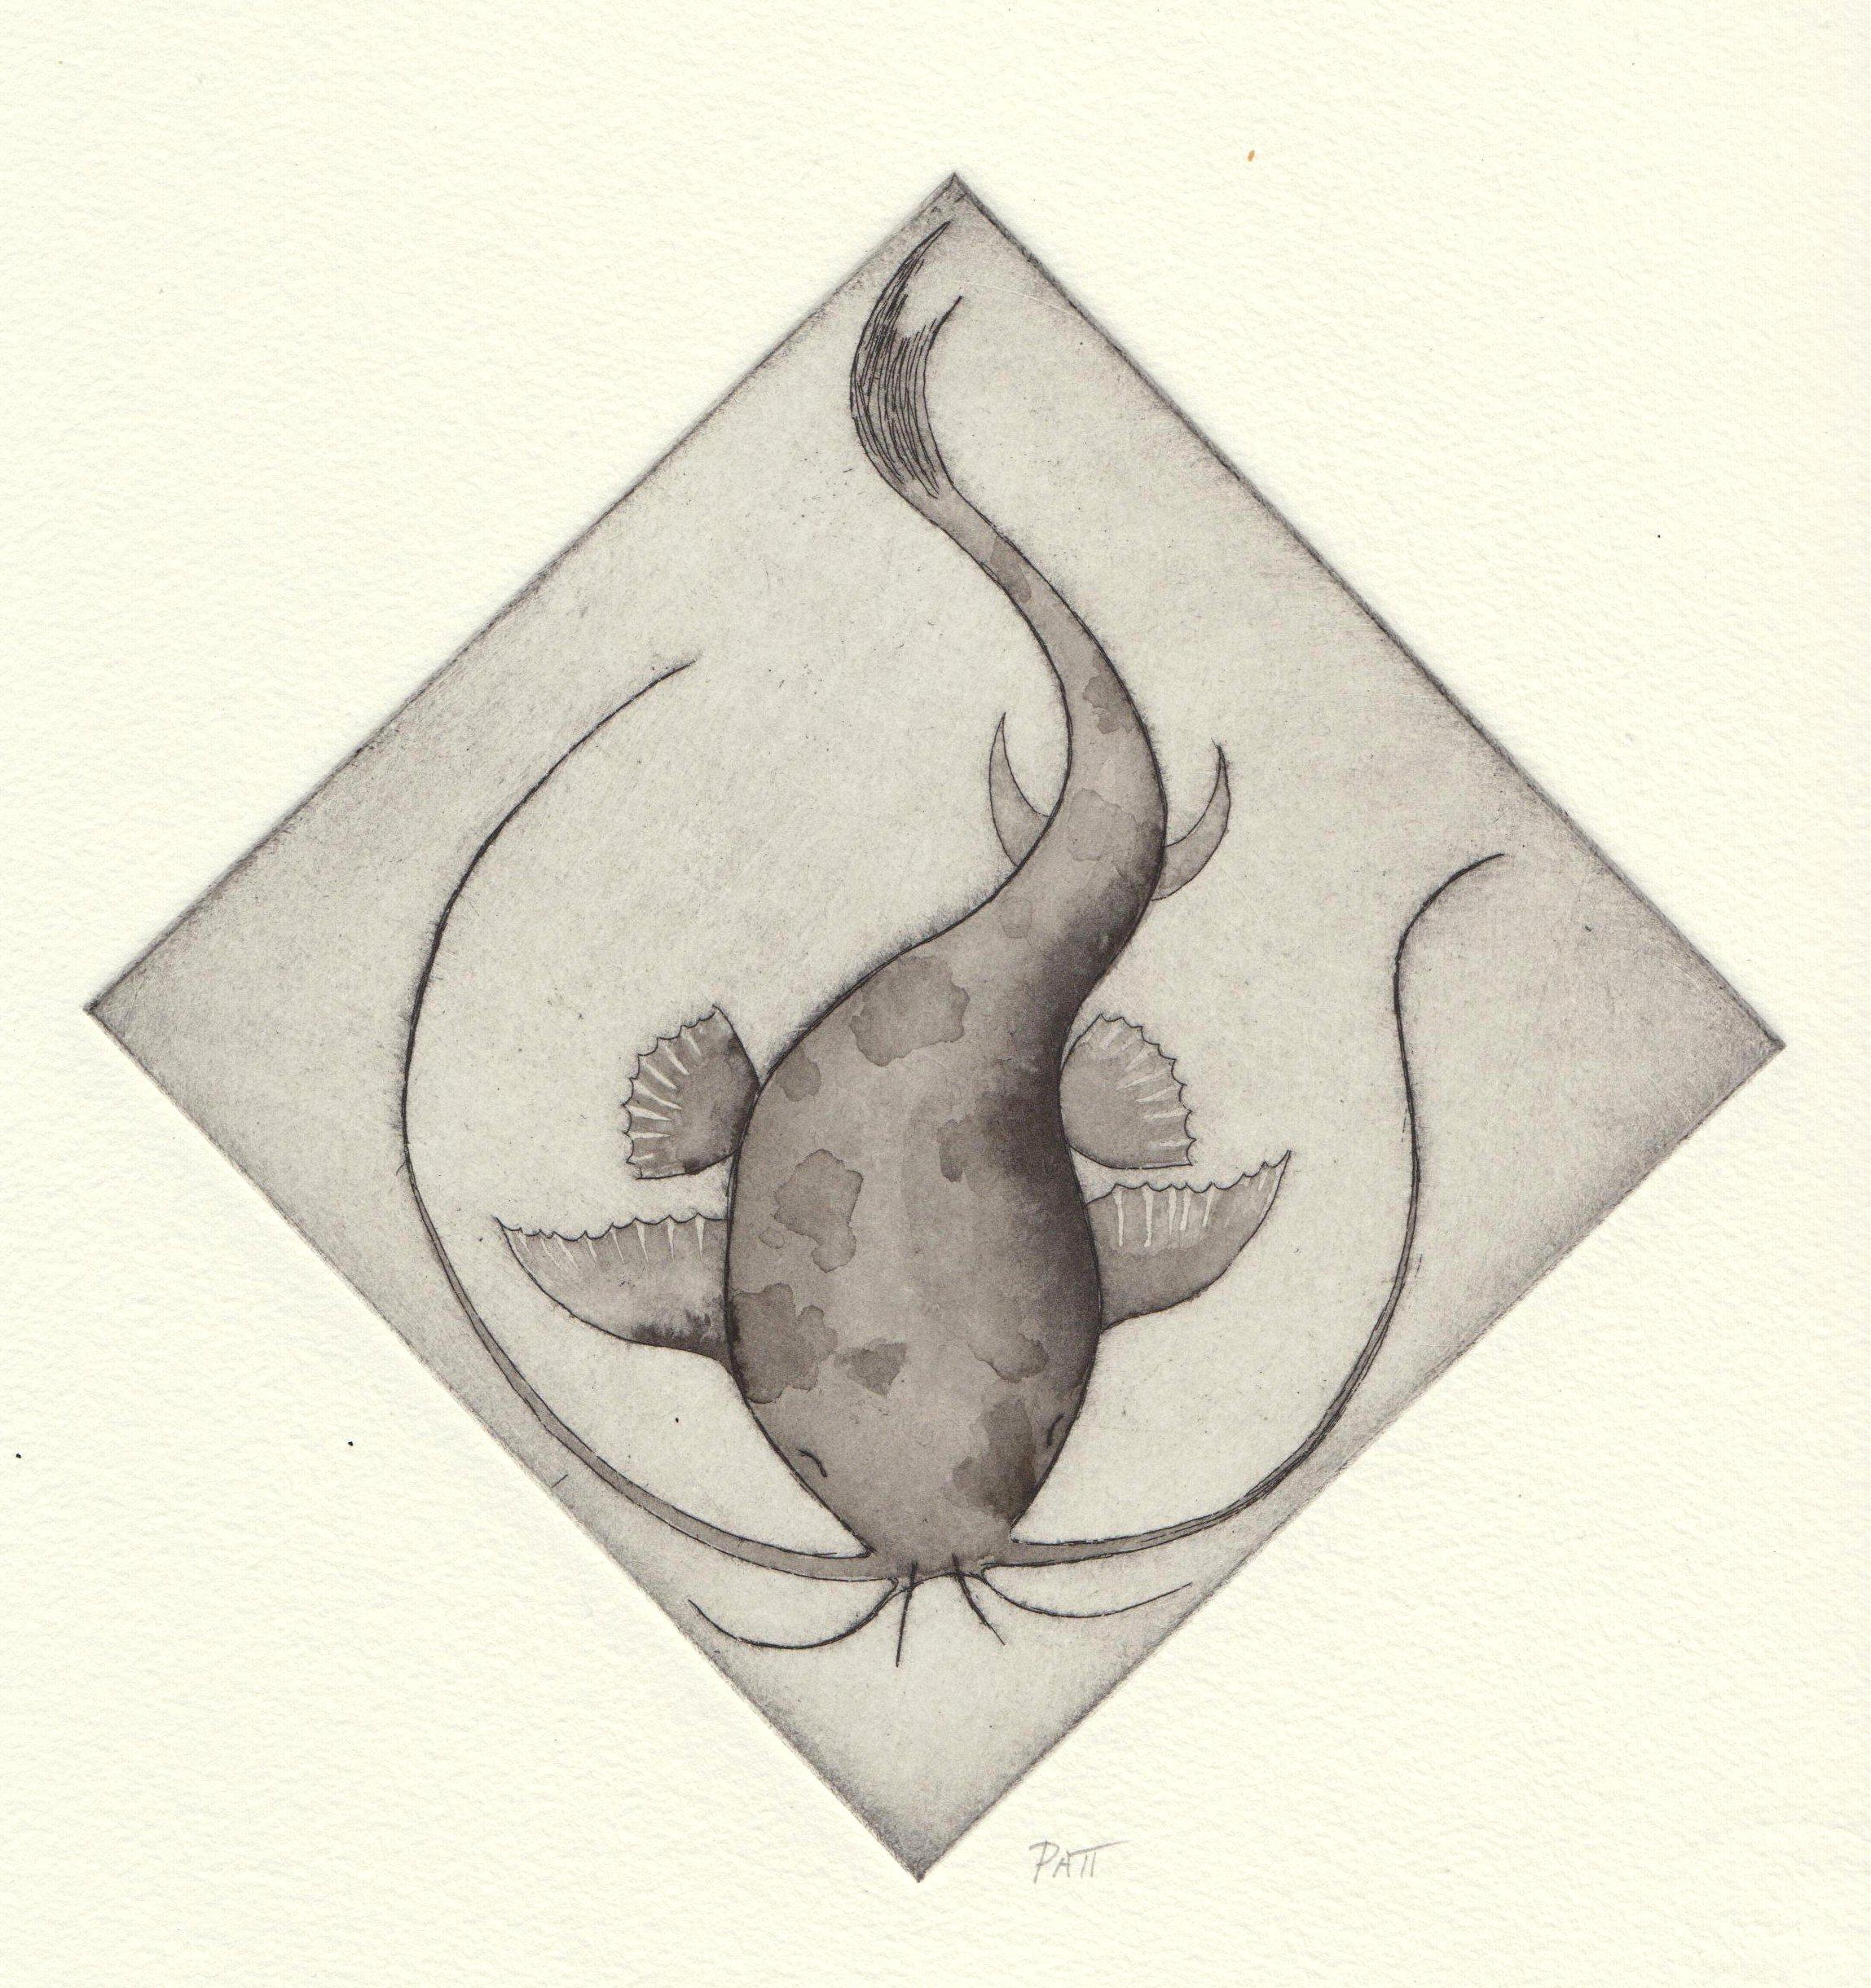 Catfish 1 - hand tinted etching - 1of1.jpg.jpeg